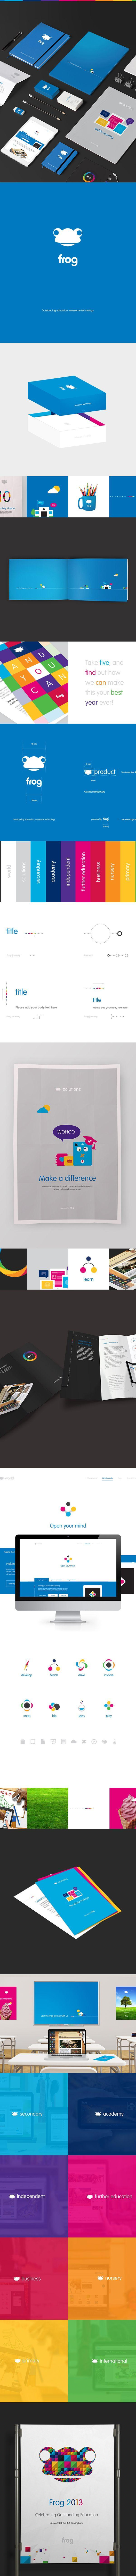 Frogtrade by Samuel James Oxley, via Behance | #stationary #corporate #design #corporatedesign #identity #branding #marketing < repinned by www.BlickeDeeler.de | Take a look at www.LogoGestaltung-Hamburg.de